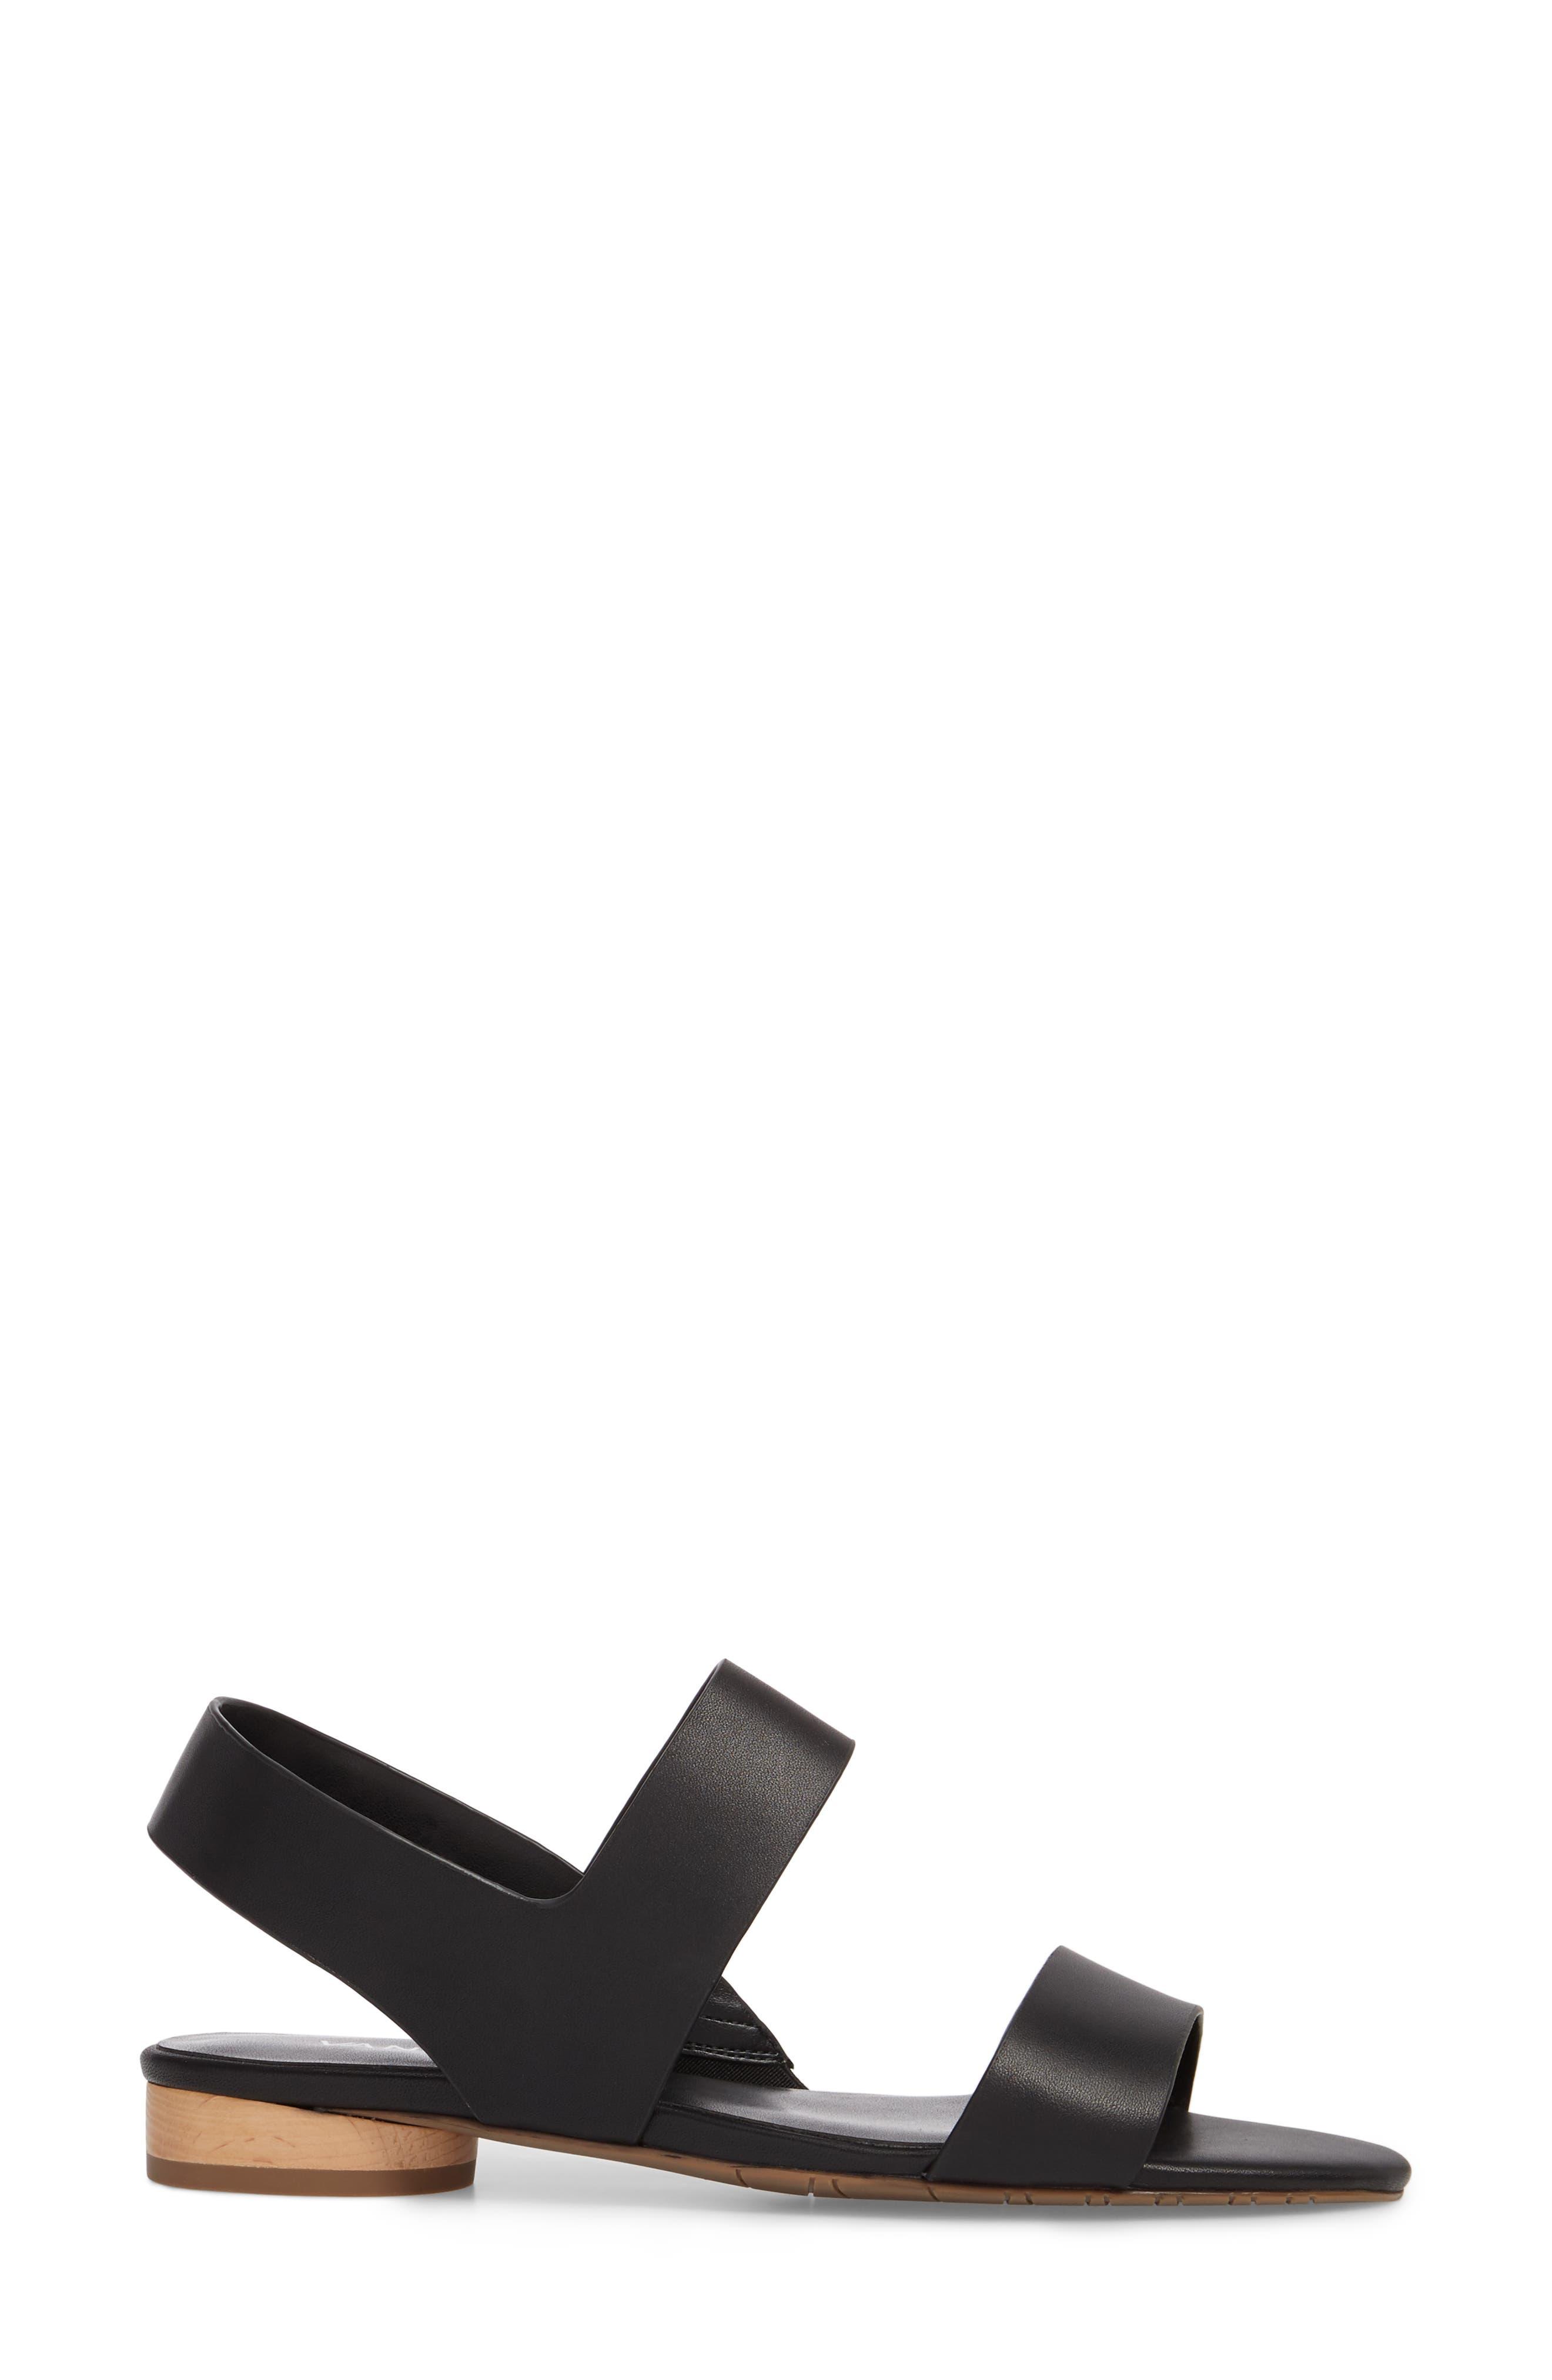 Blanka Sandal,                             Alternate thumbnail 3, color,                             BLACK LEATHER